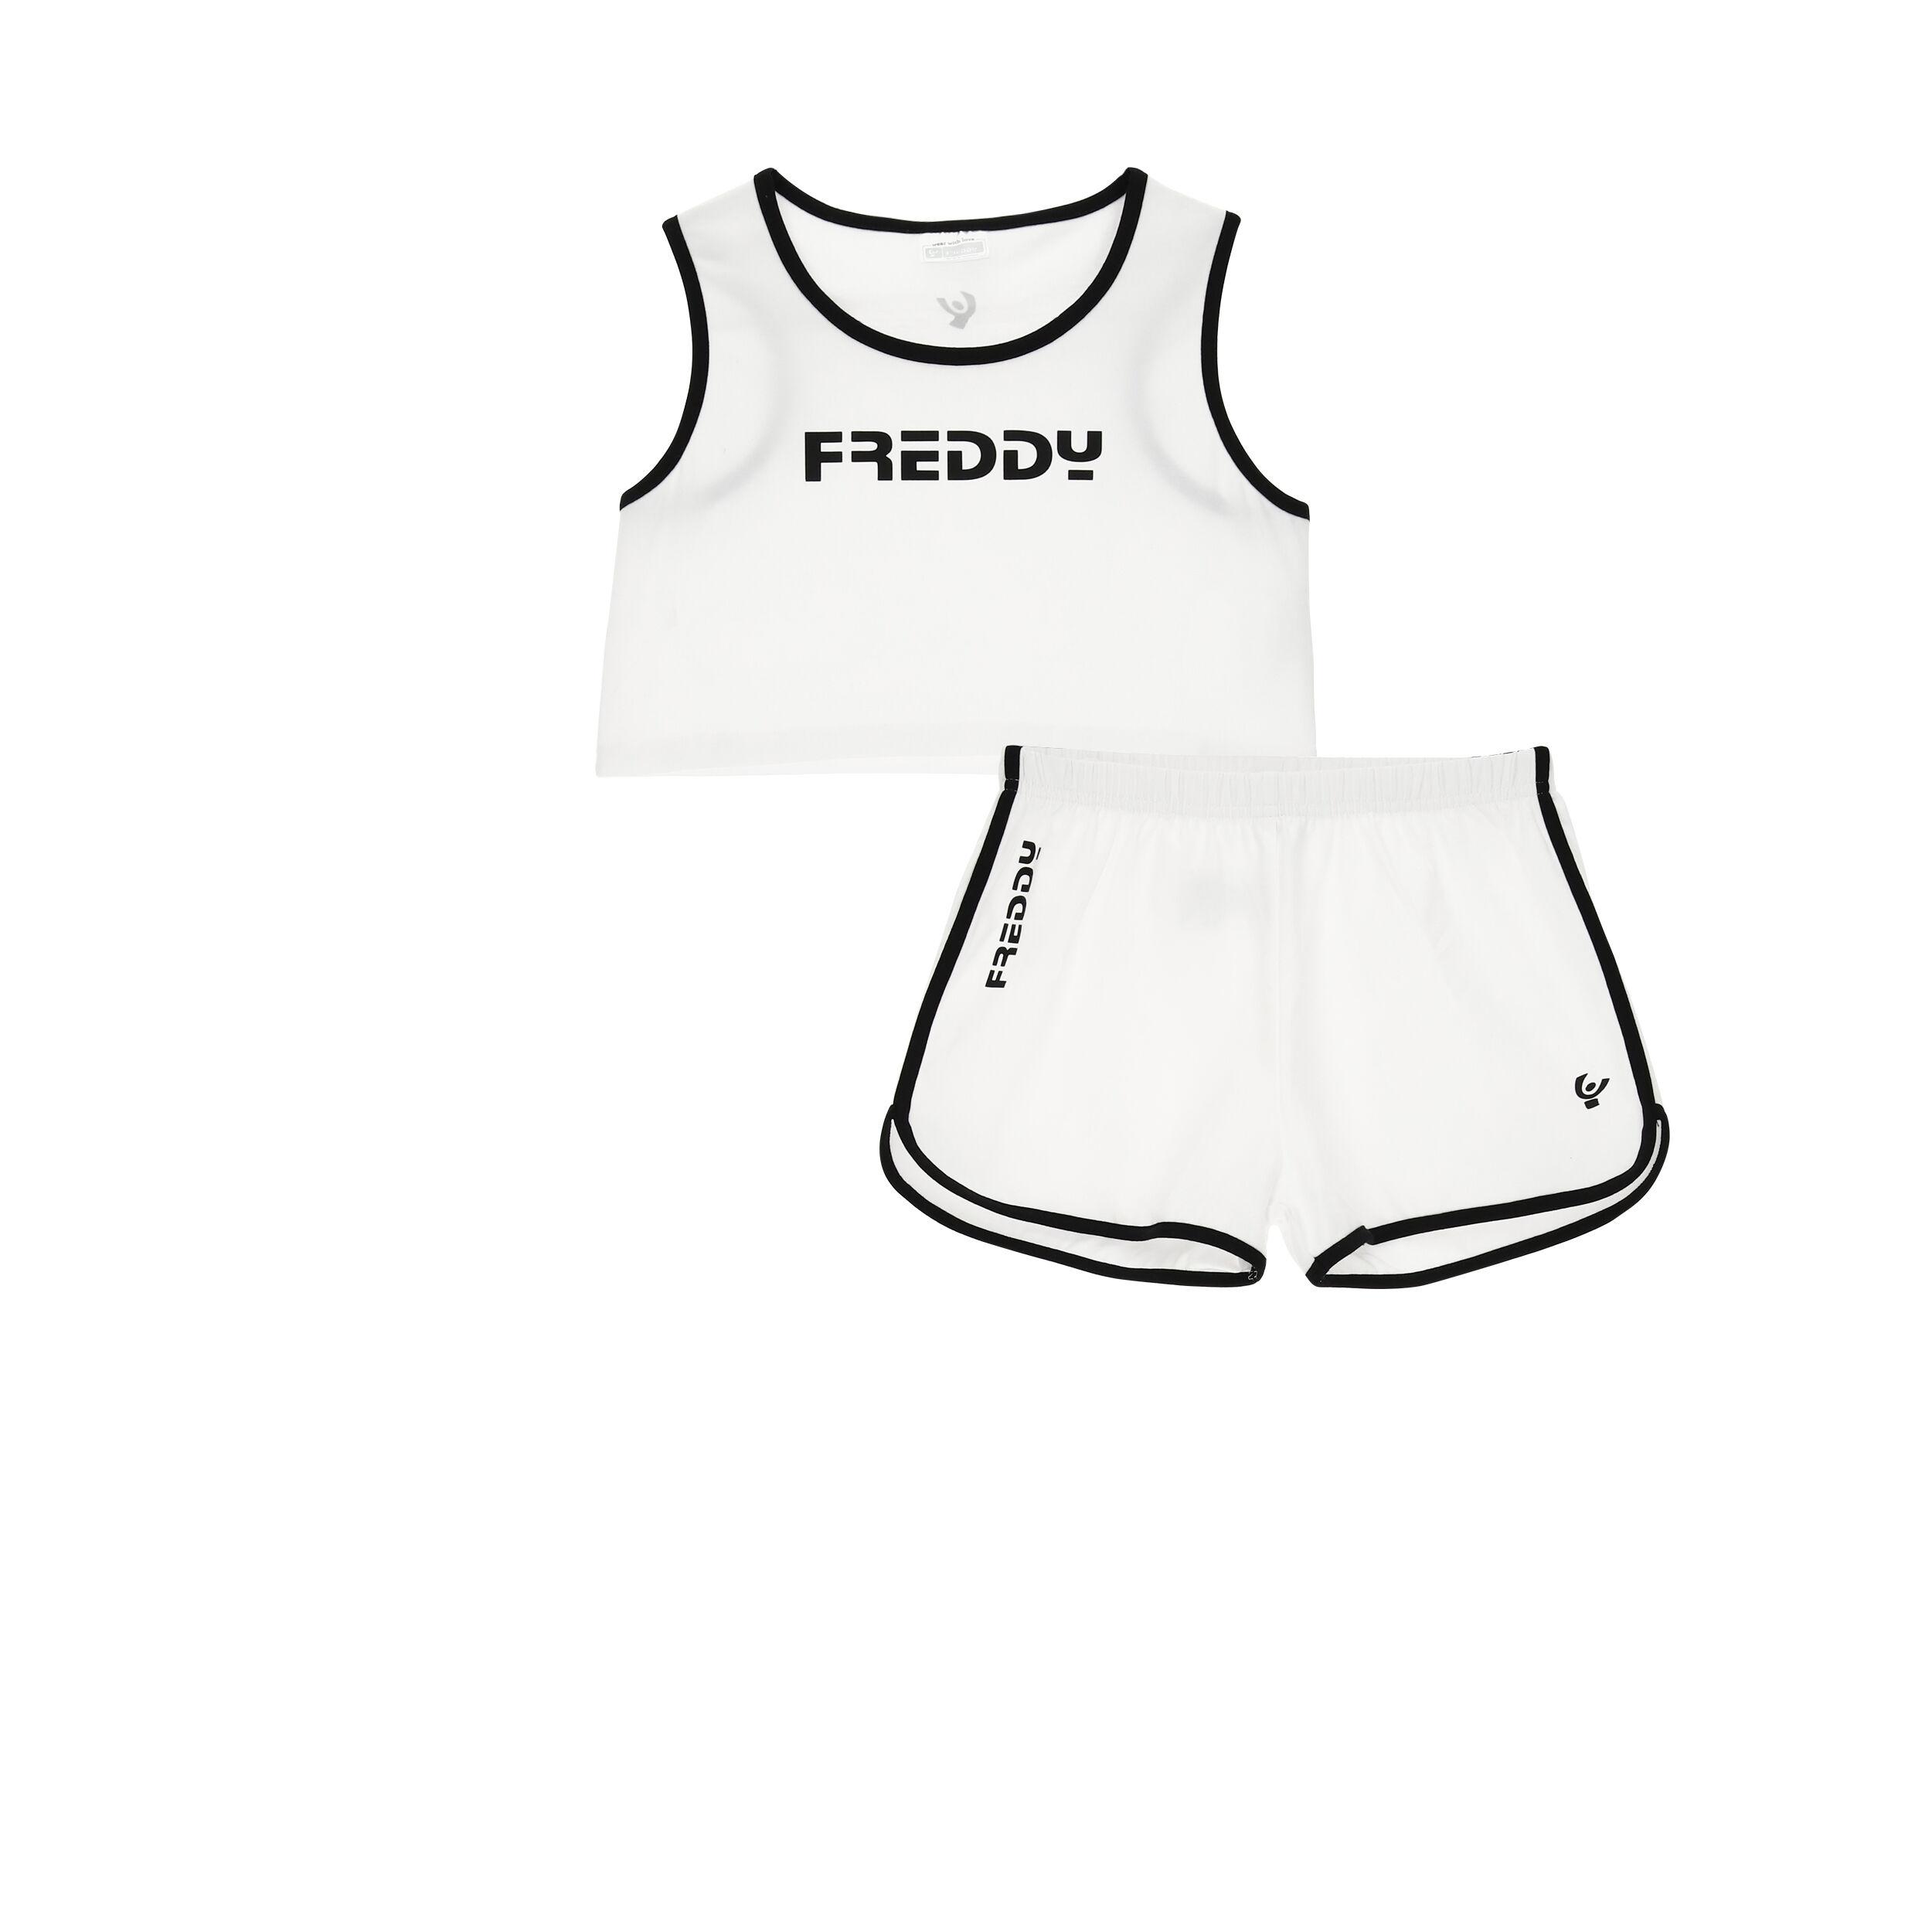 Freddy Completo canotta cropped e shorts – Bambina 6-8 anni Bianco